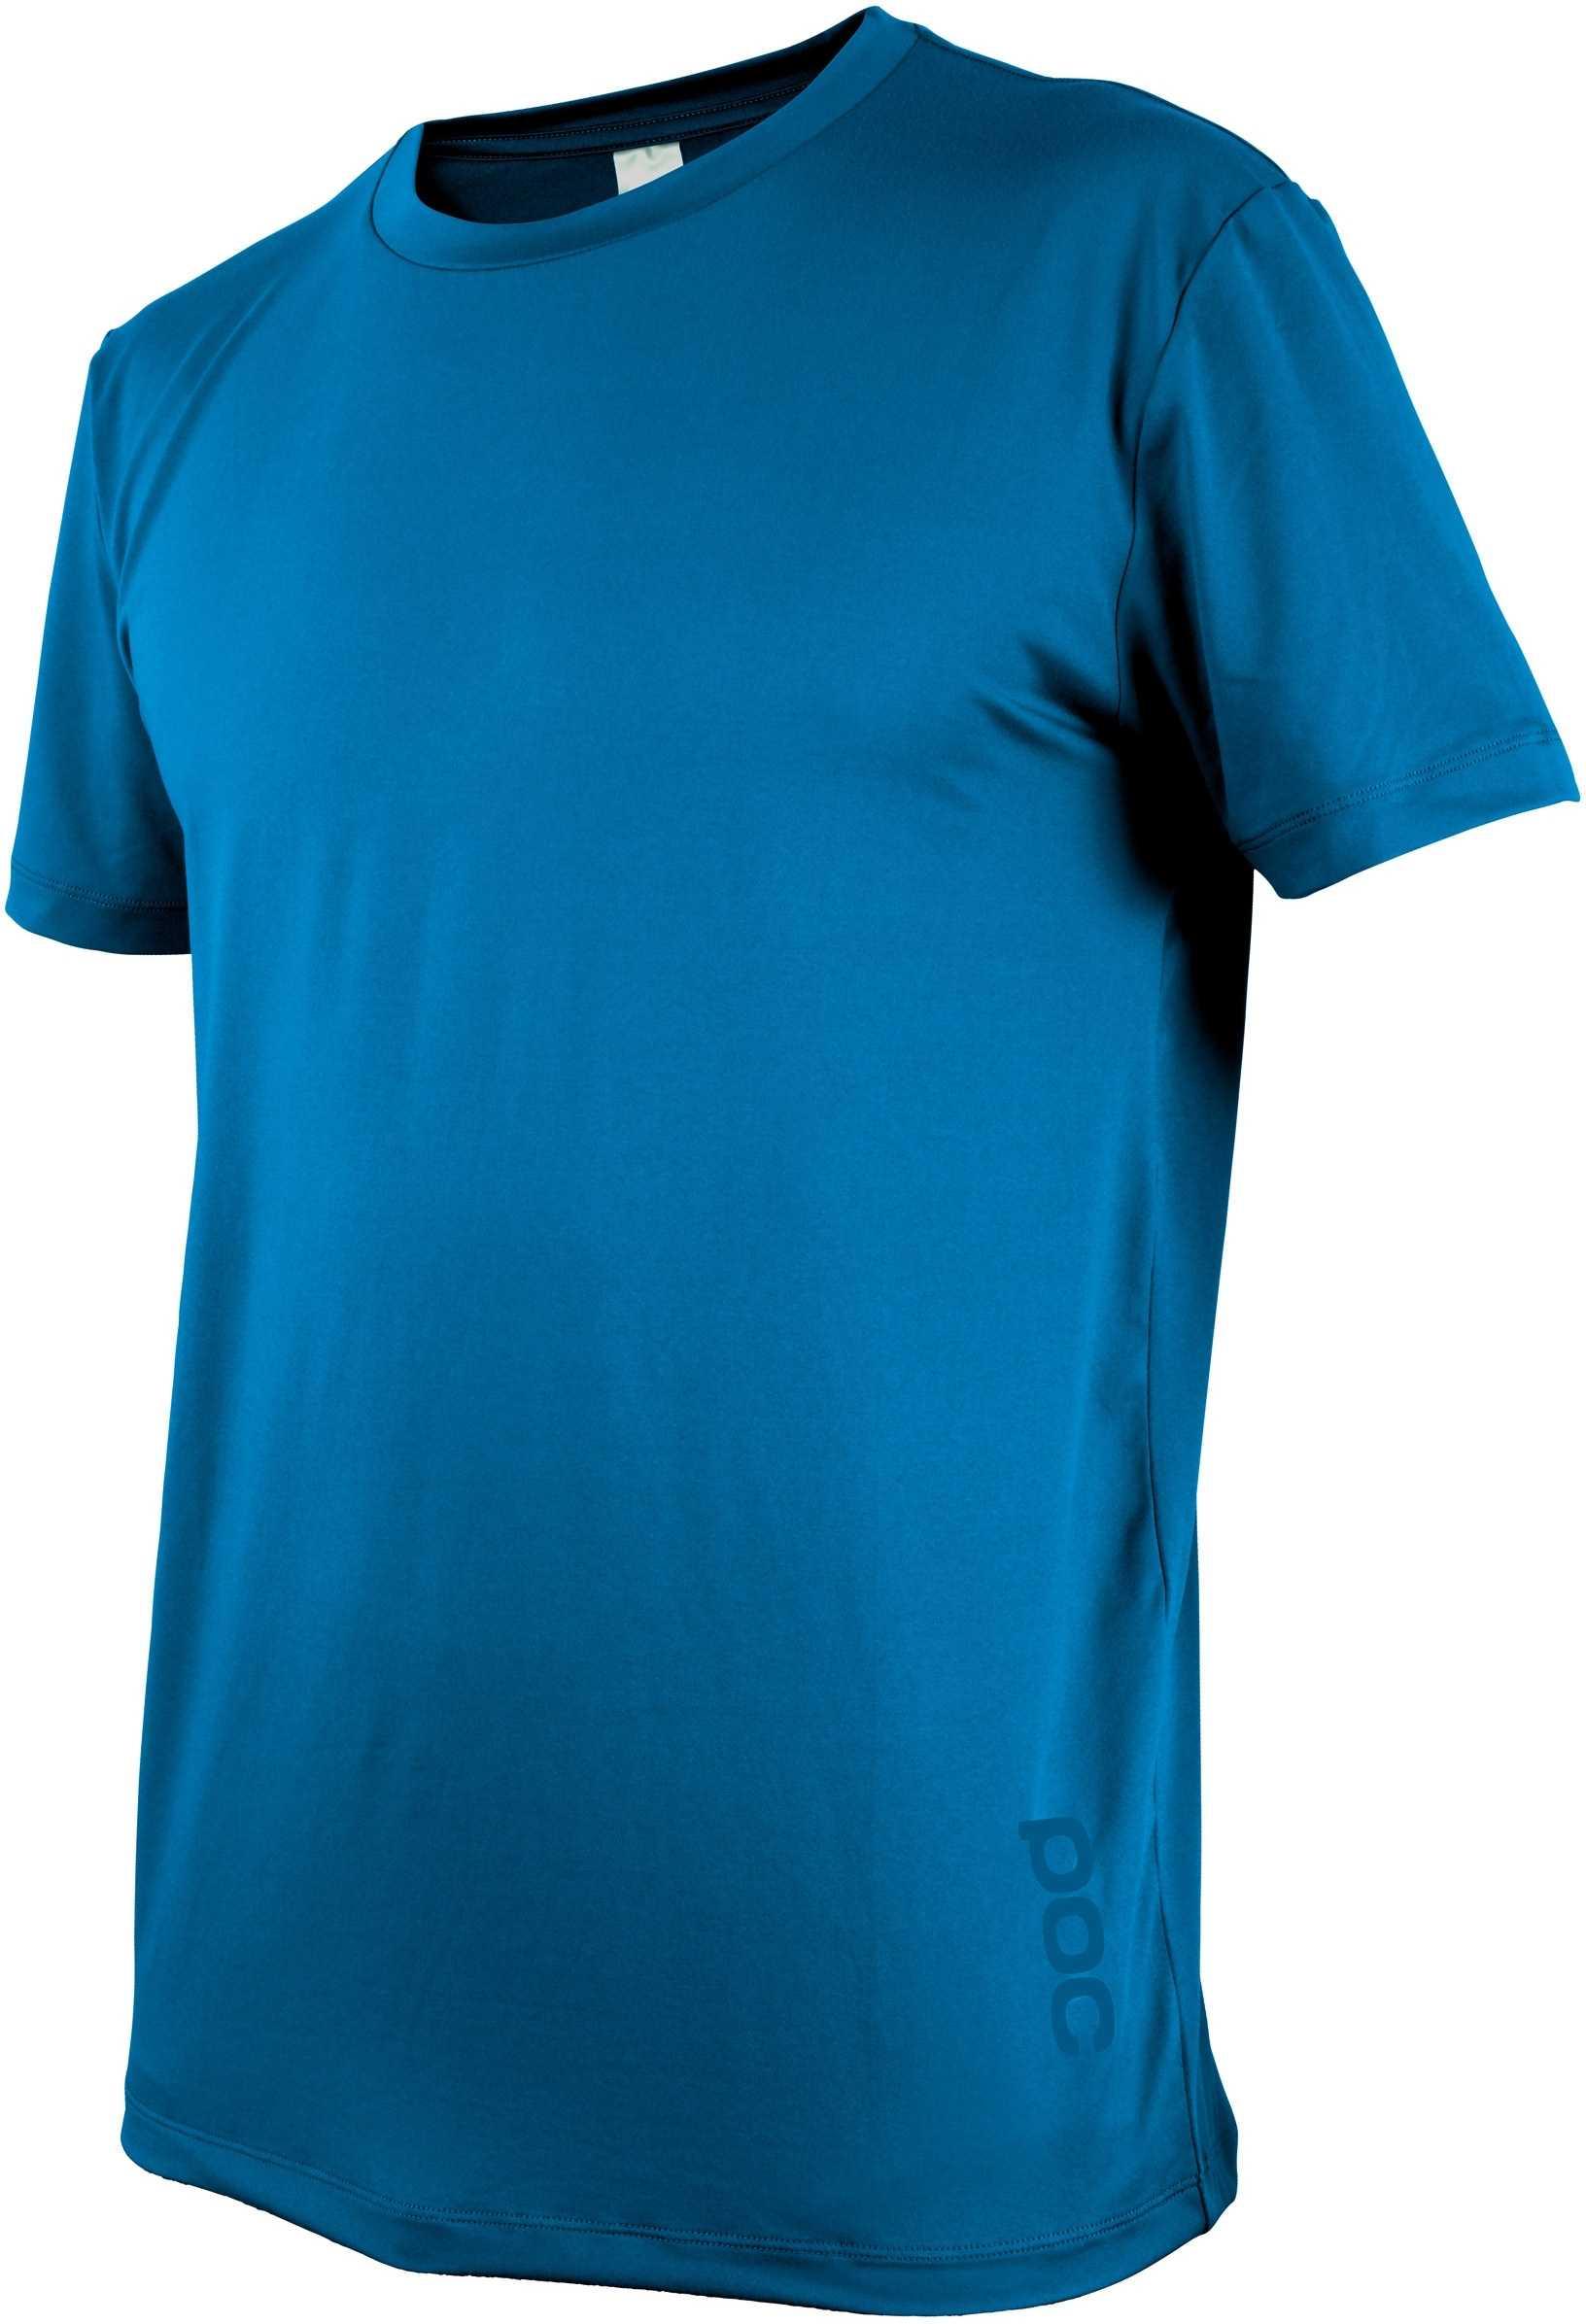 Trøje POC Resistance Enduro Light Tee blå | Jerseys